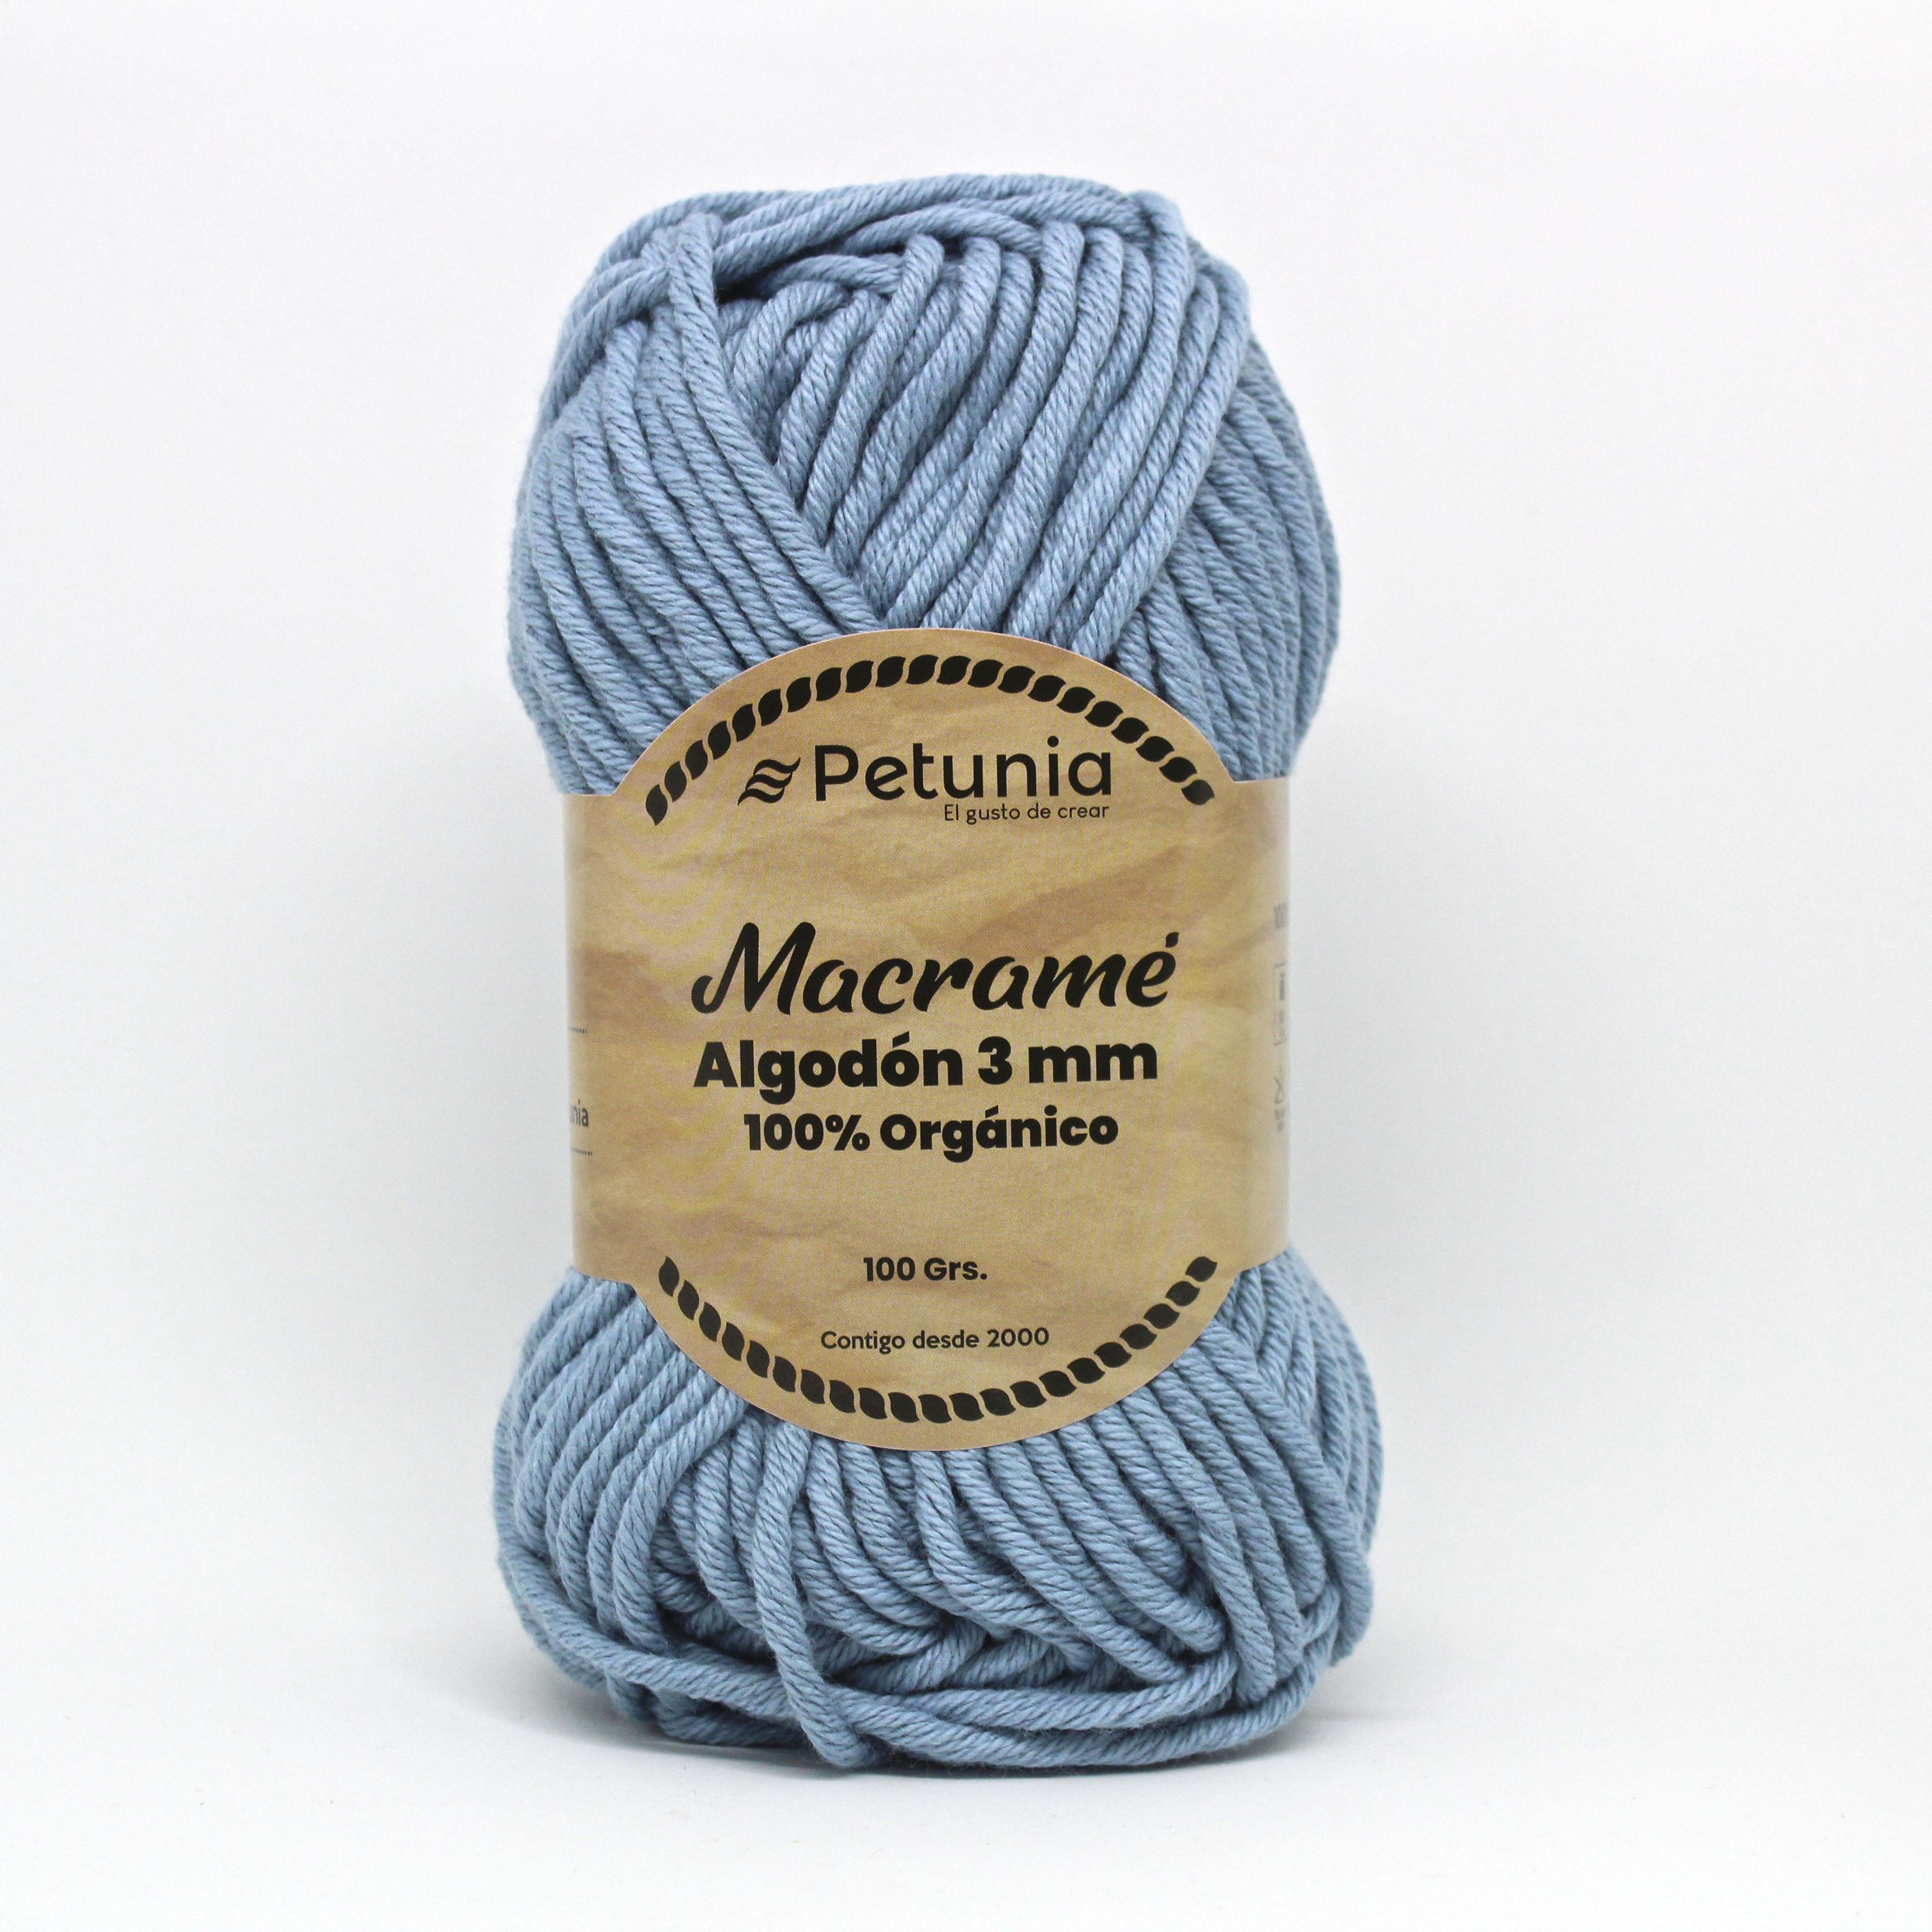 MACRAME ALGODON 3 MM - 6012